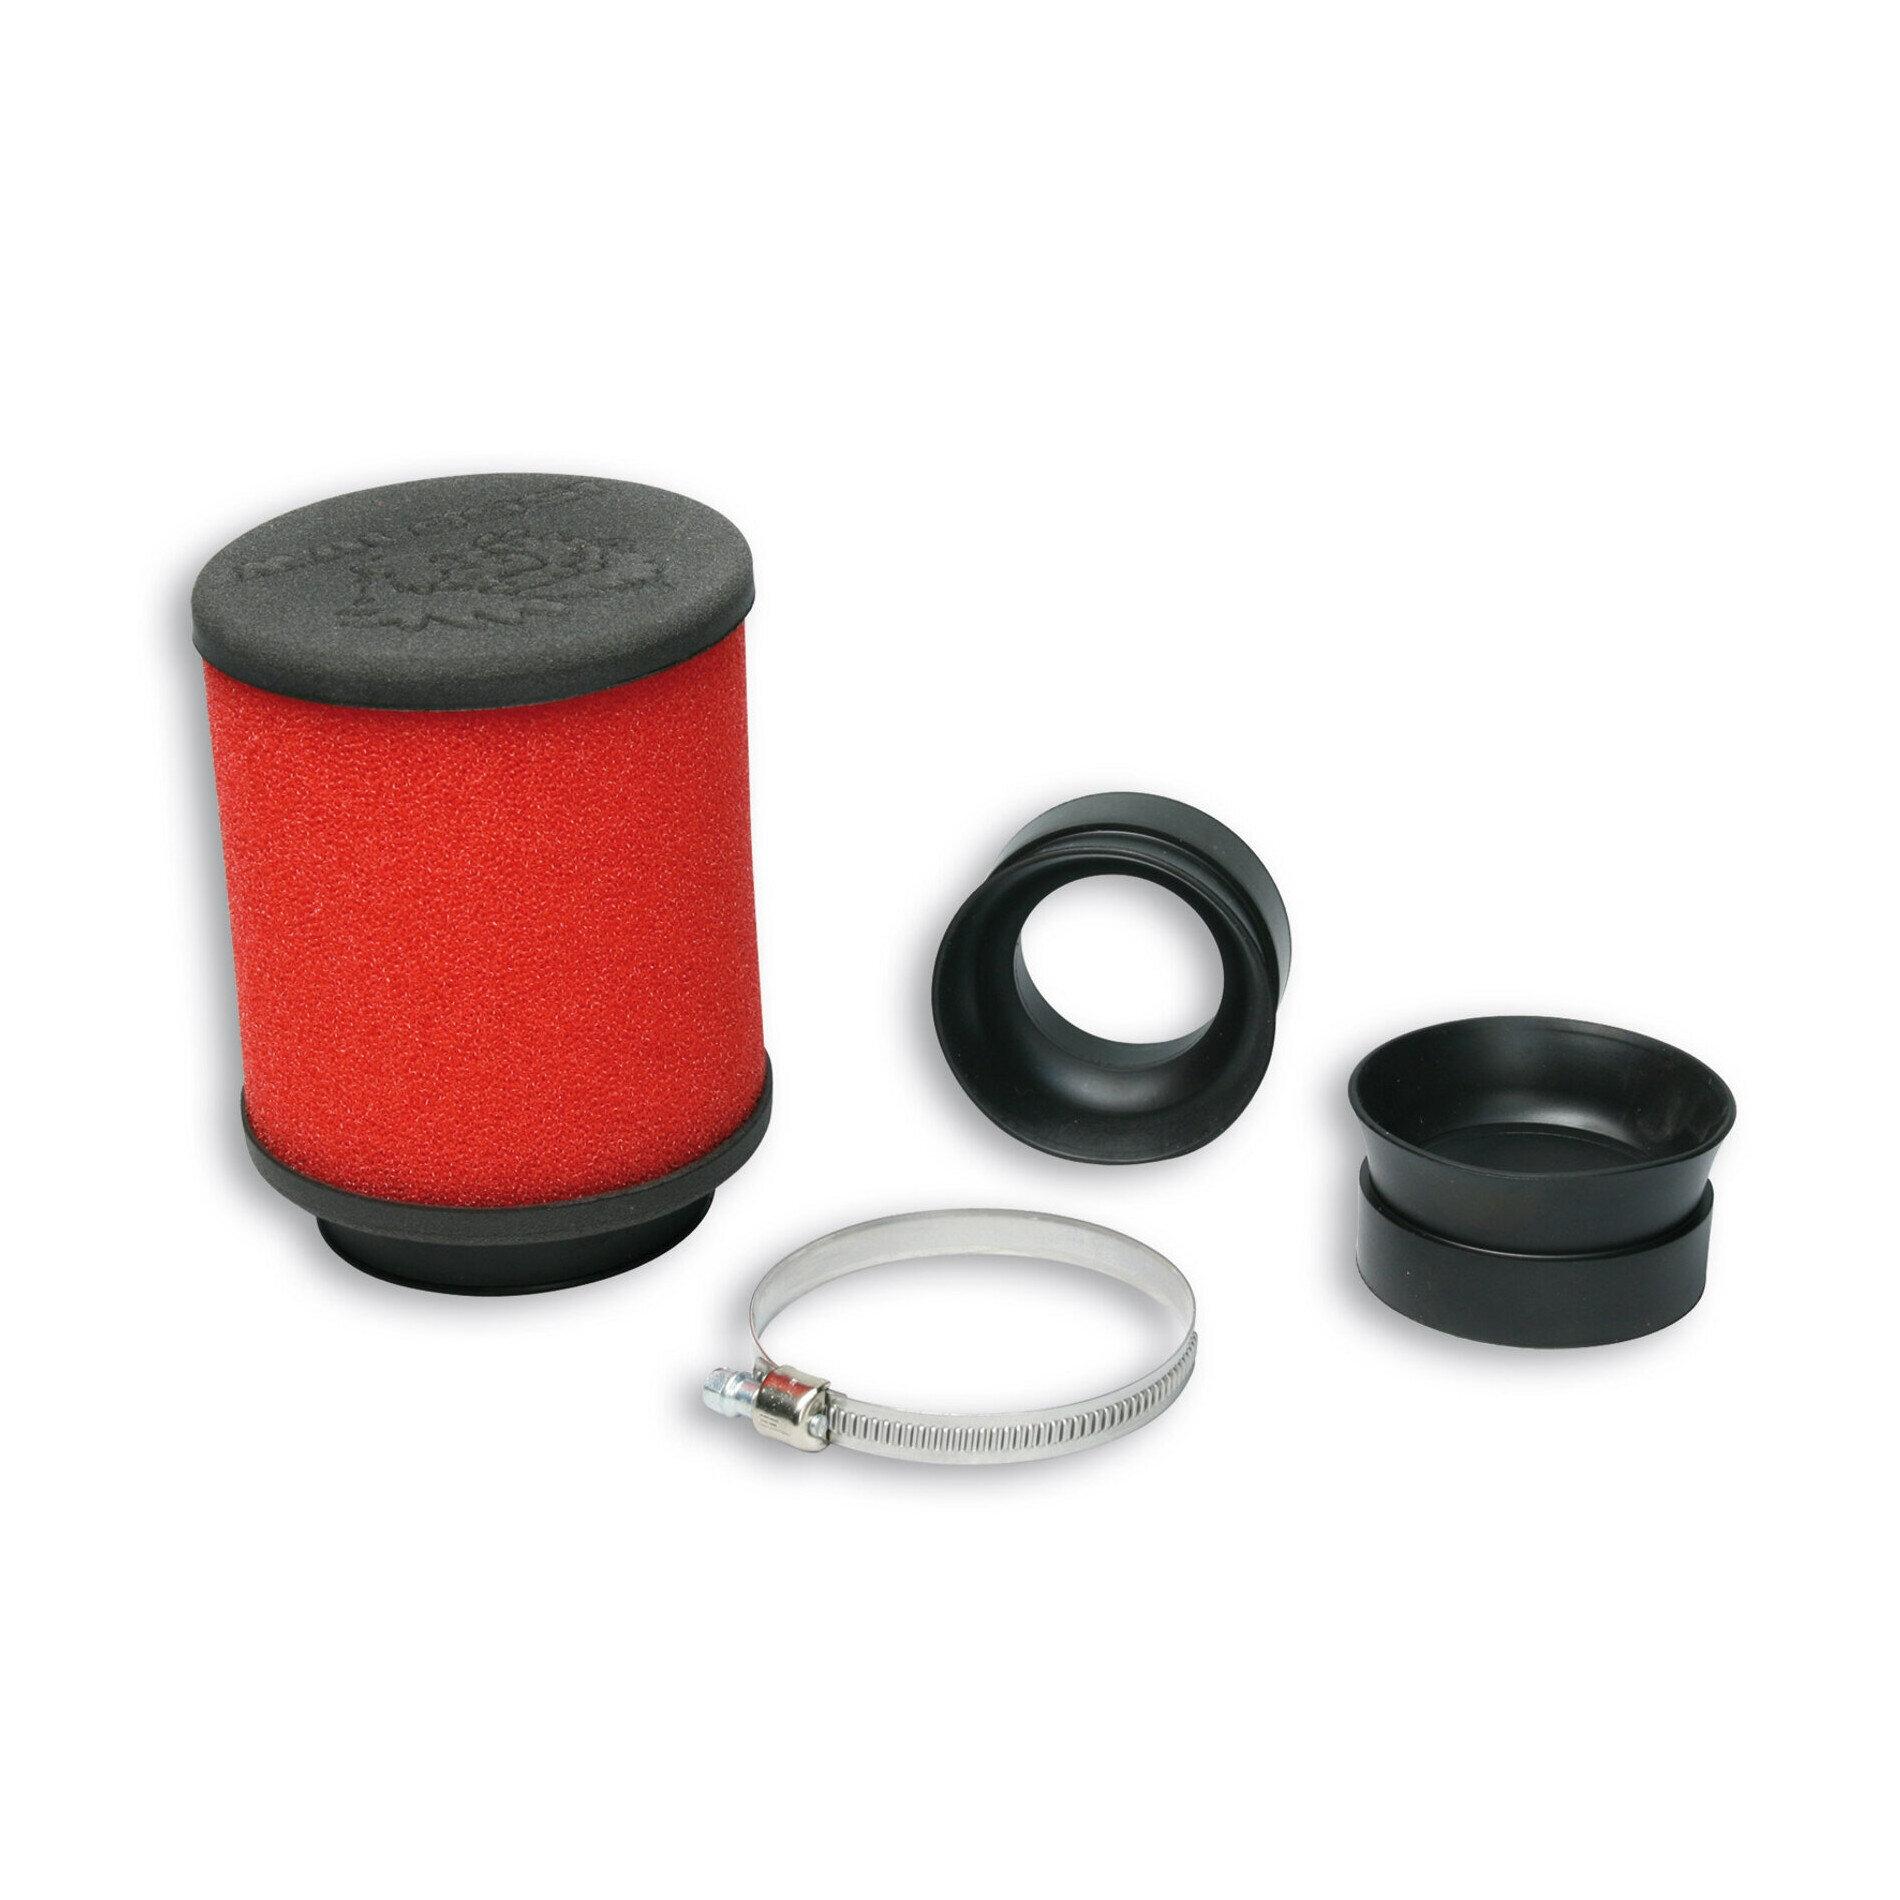 Filtre à air Malossi E16 Red Filter - 58,5 mm